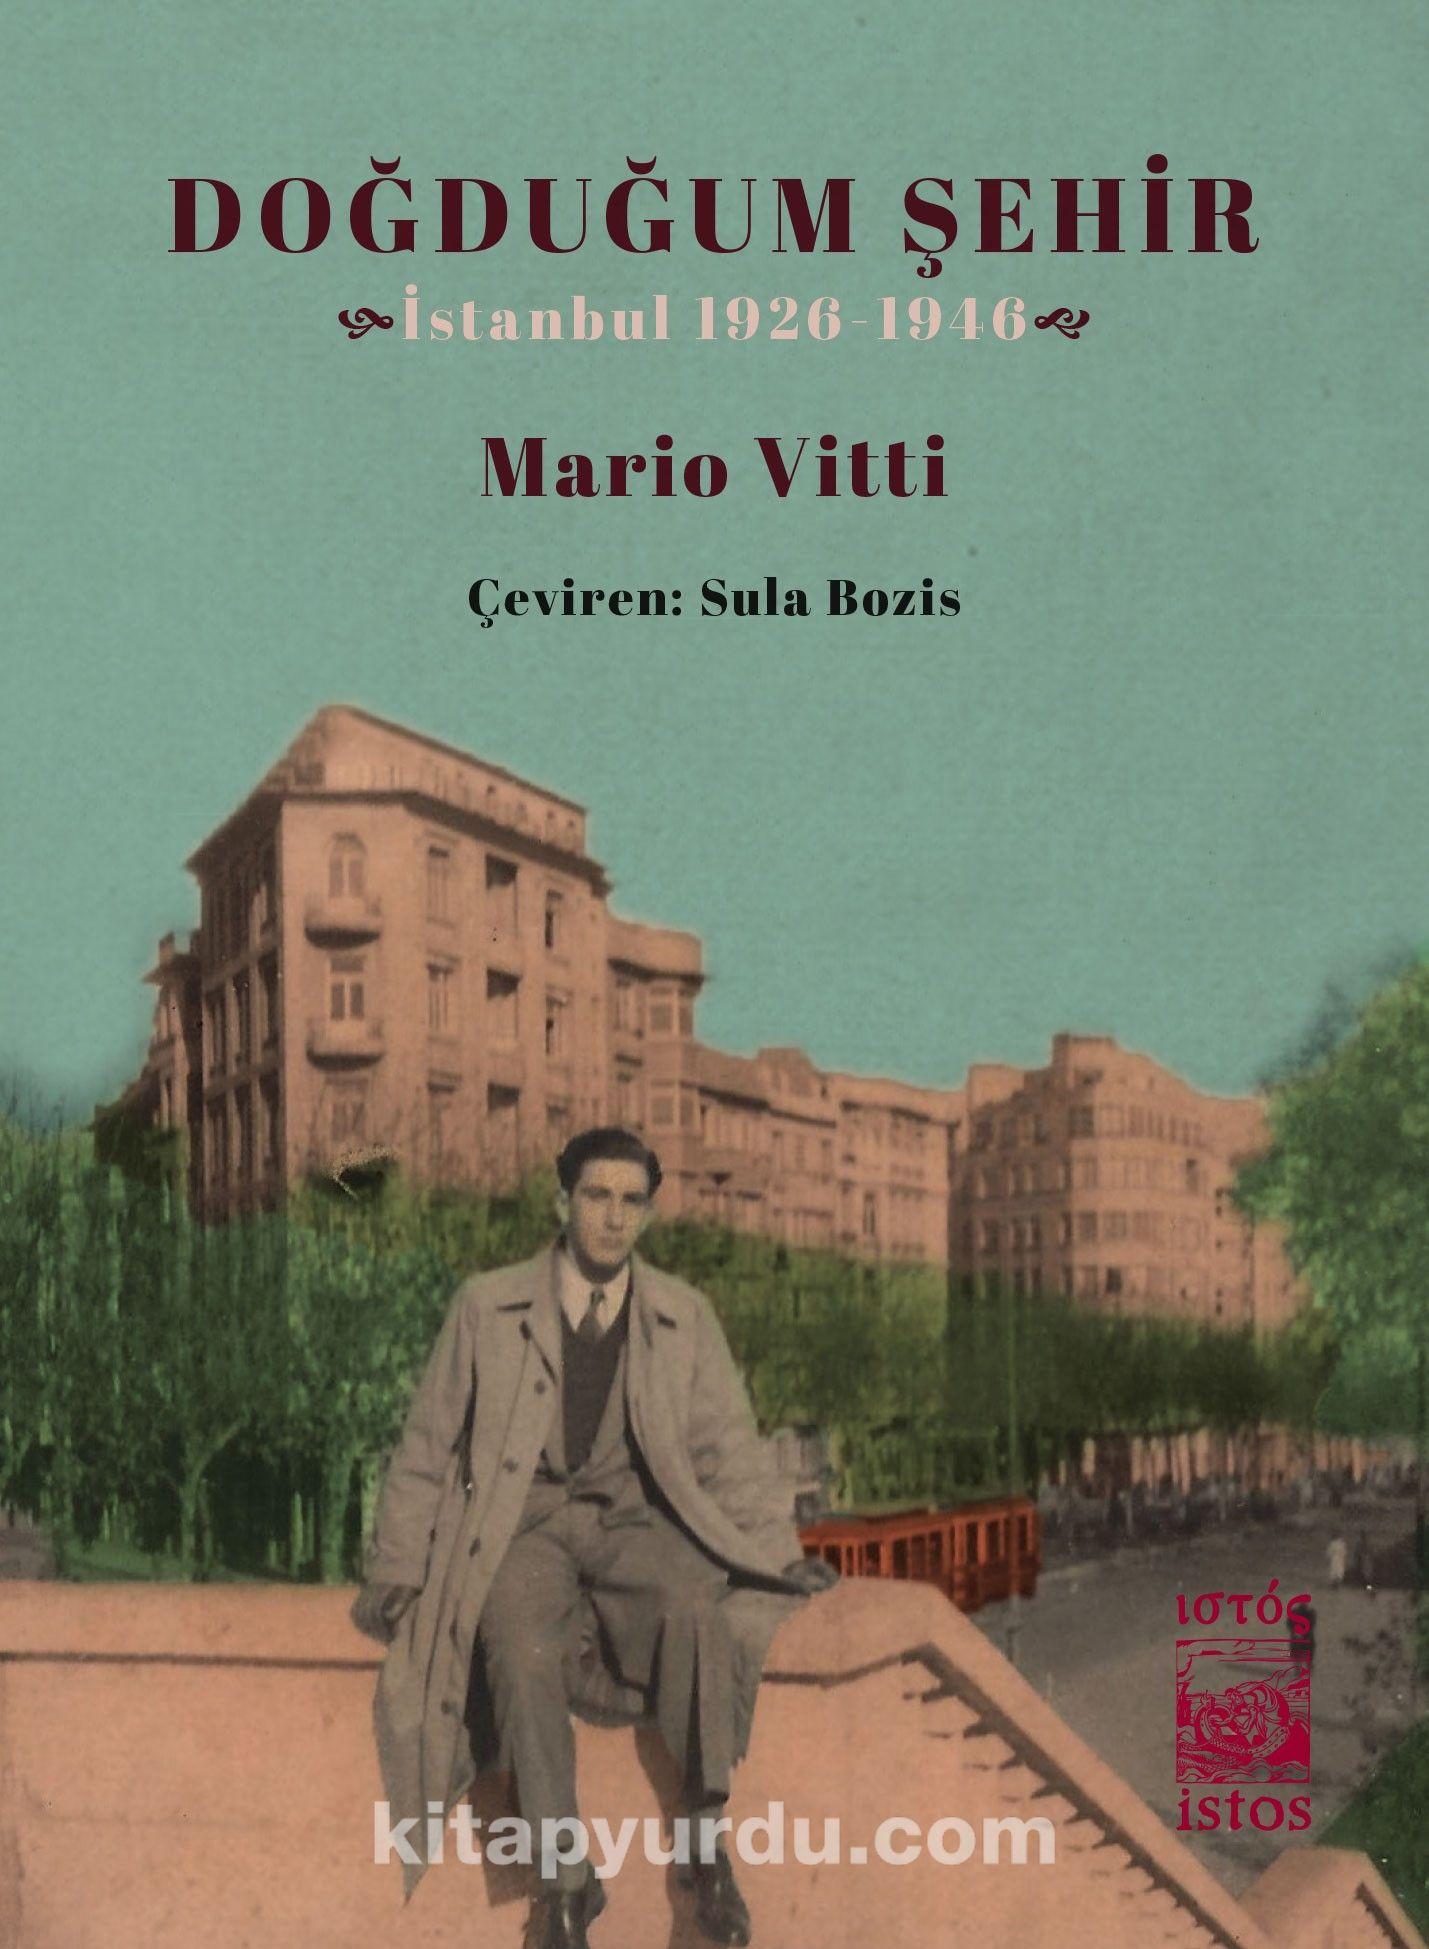 Doğduğum Şehirİstanbul 1926-1946